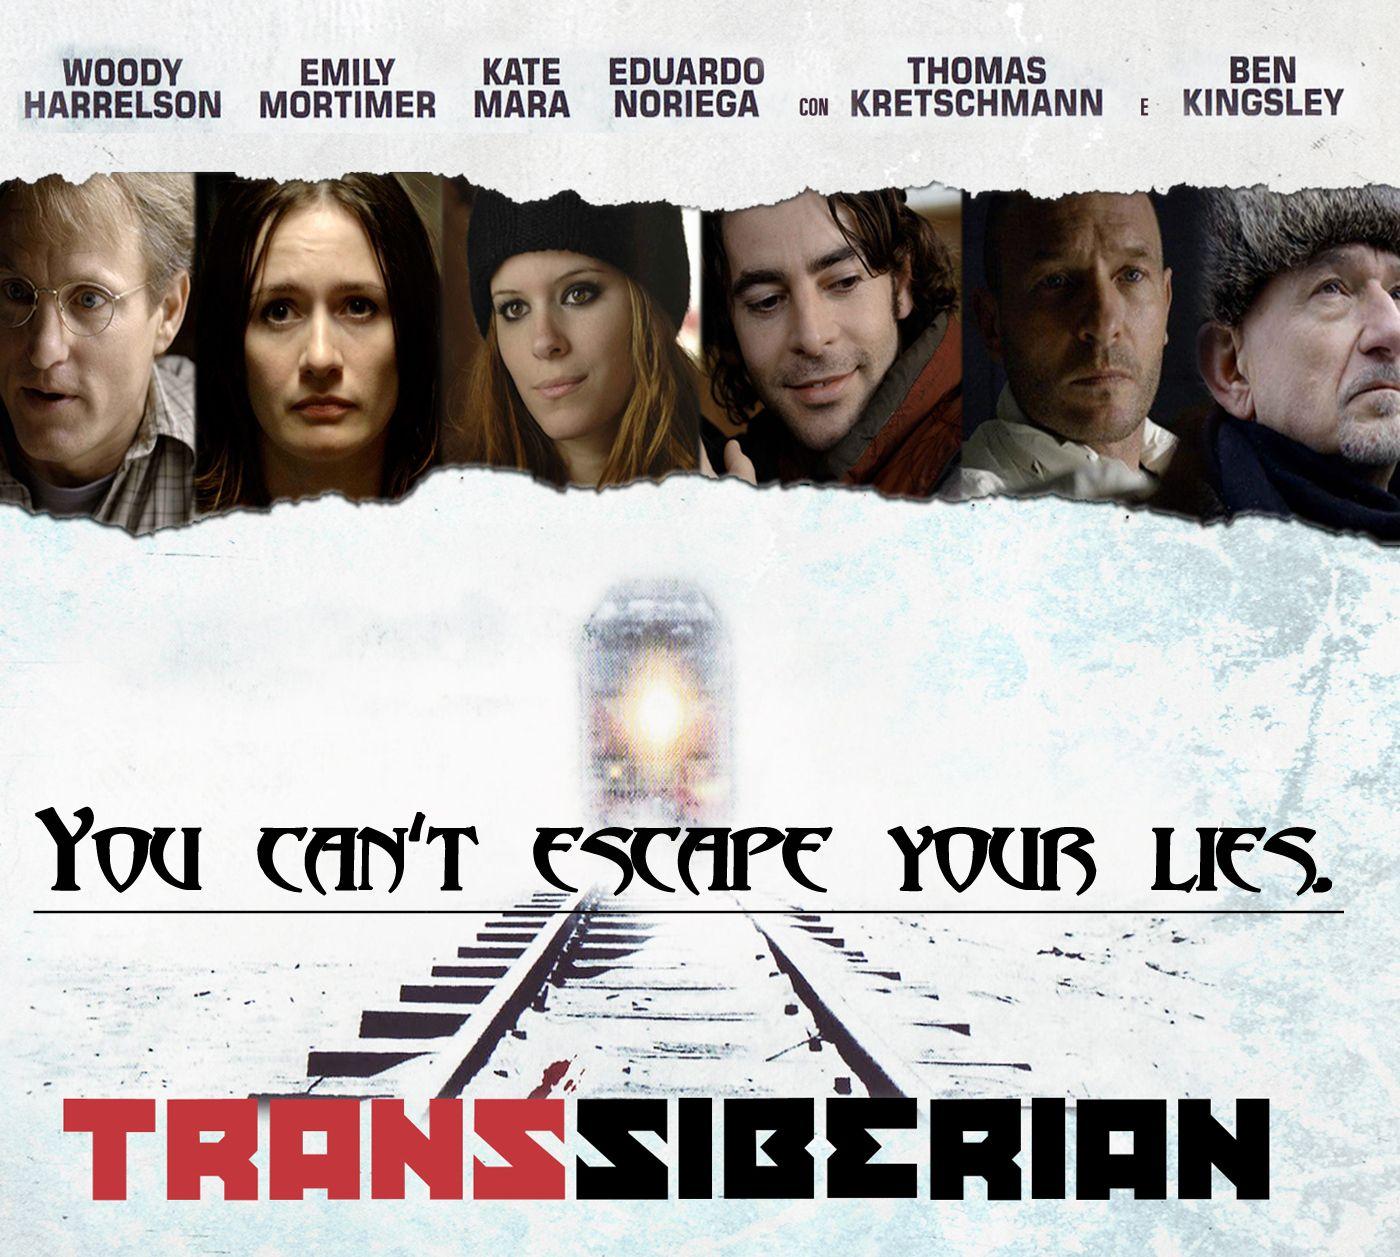 Transsiberian #psychothriller #movies #taglines | Movie taglines ...